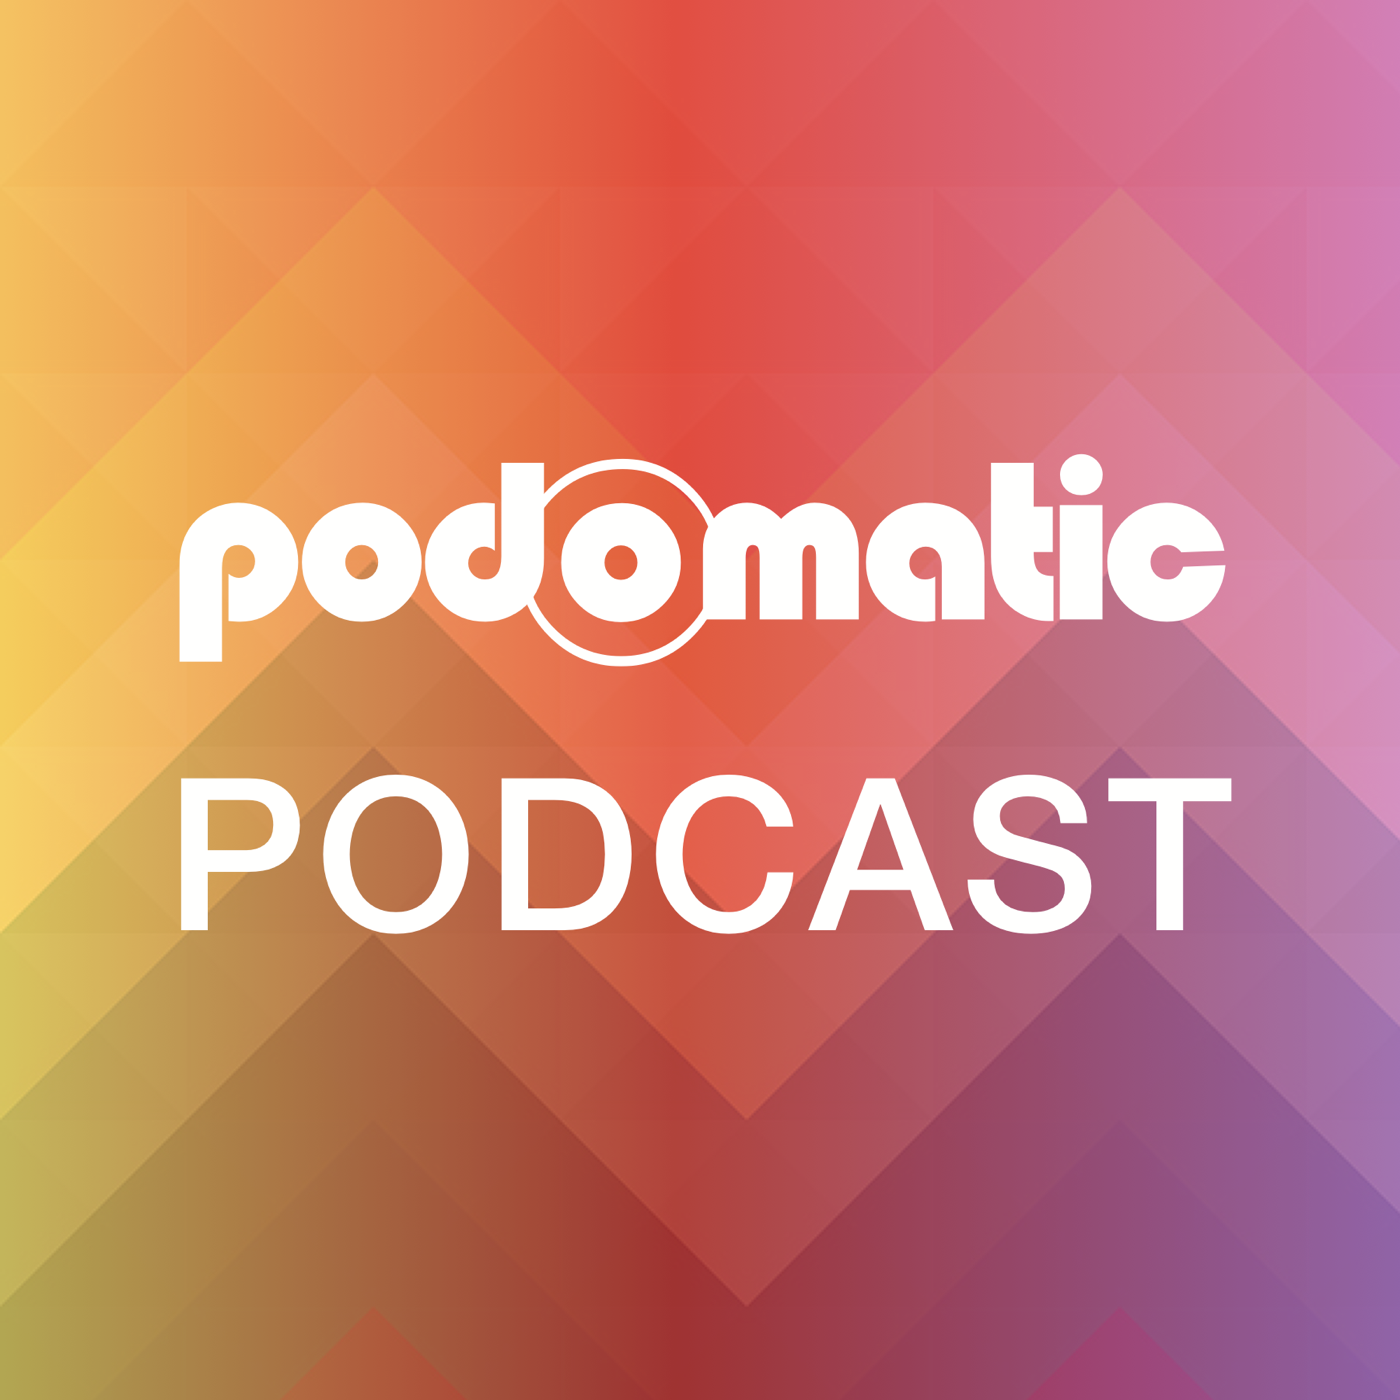 Barry Browder's Podcast